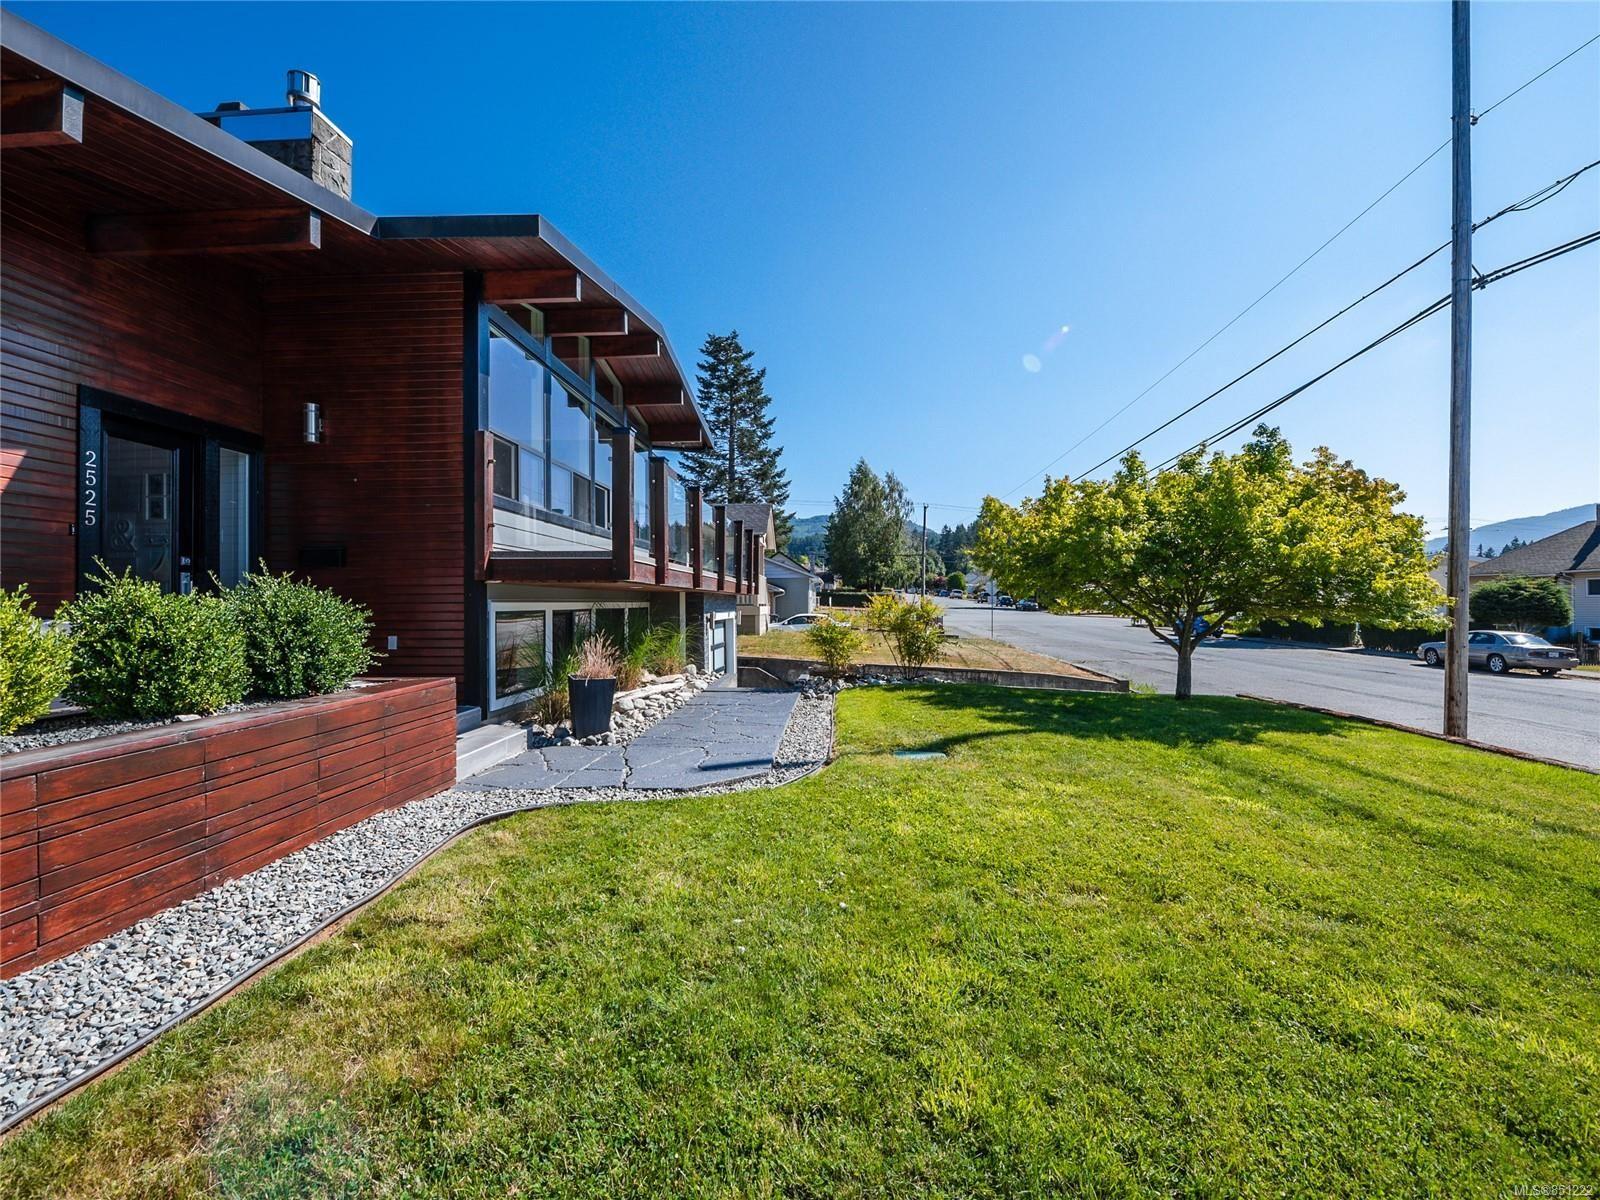 Photo 35: Photos: 2525 11th Ave in : PA Port Alberni House for sale (Port Alberni)  : MLS®# 851222